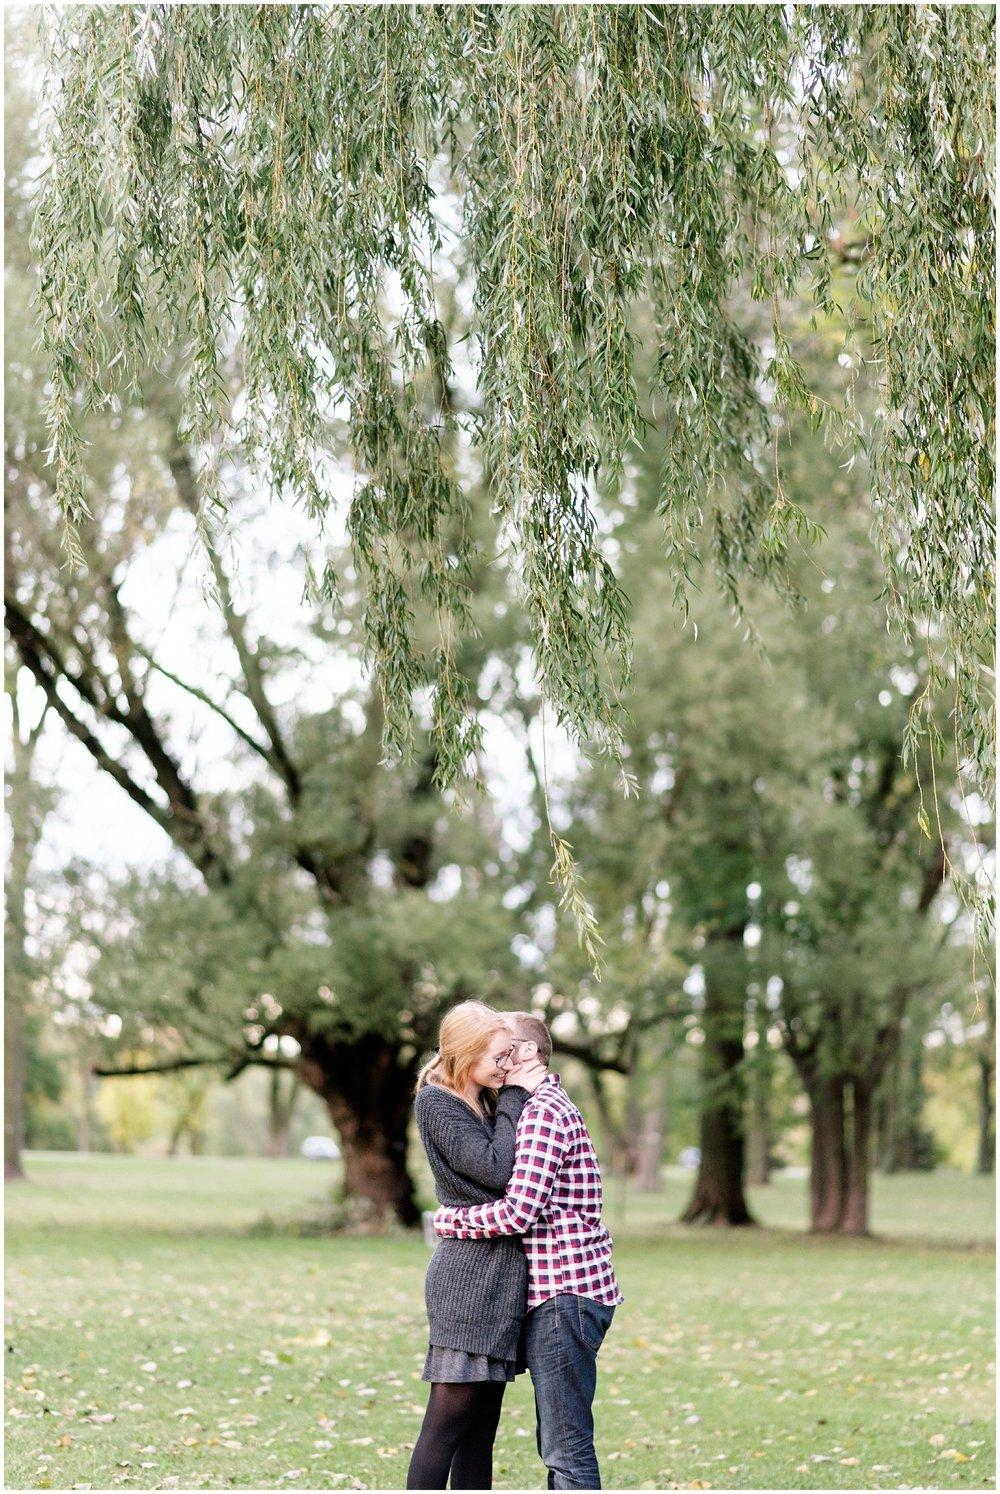 Weddings_by_Raisa_Photography_Grand_Rapids_October_Fall_Engagement_Milwaukee_Wisconsin_Photographer_0029.jpg